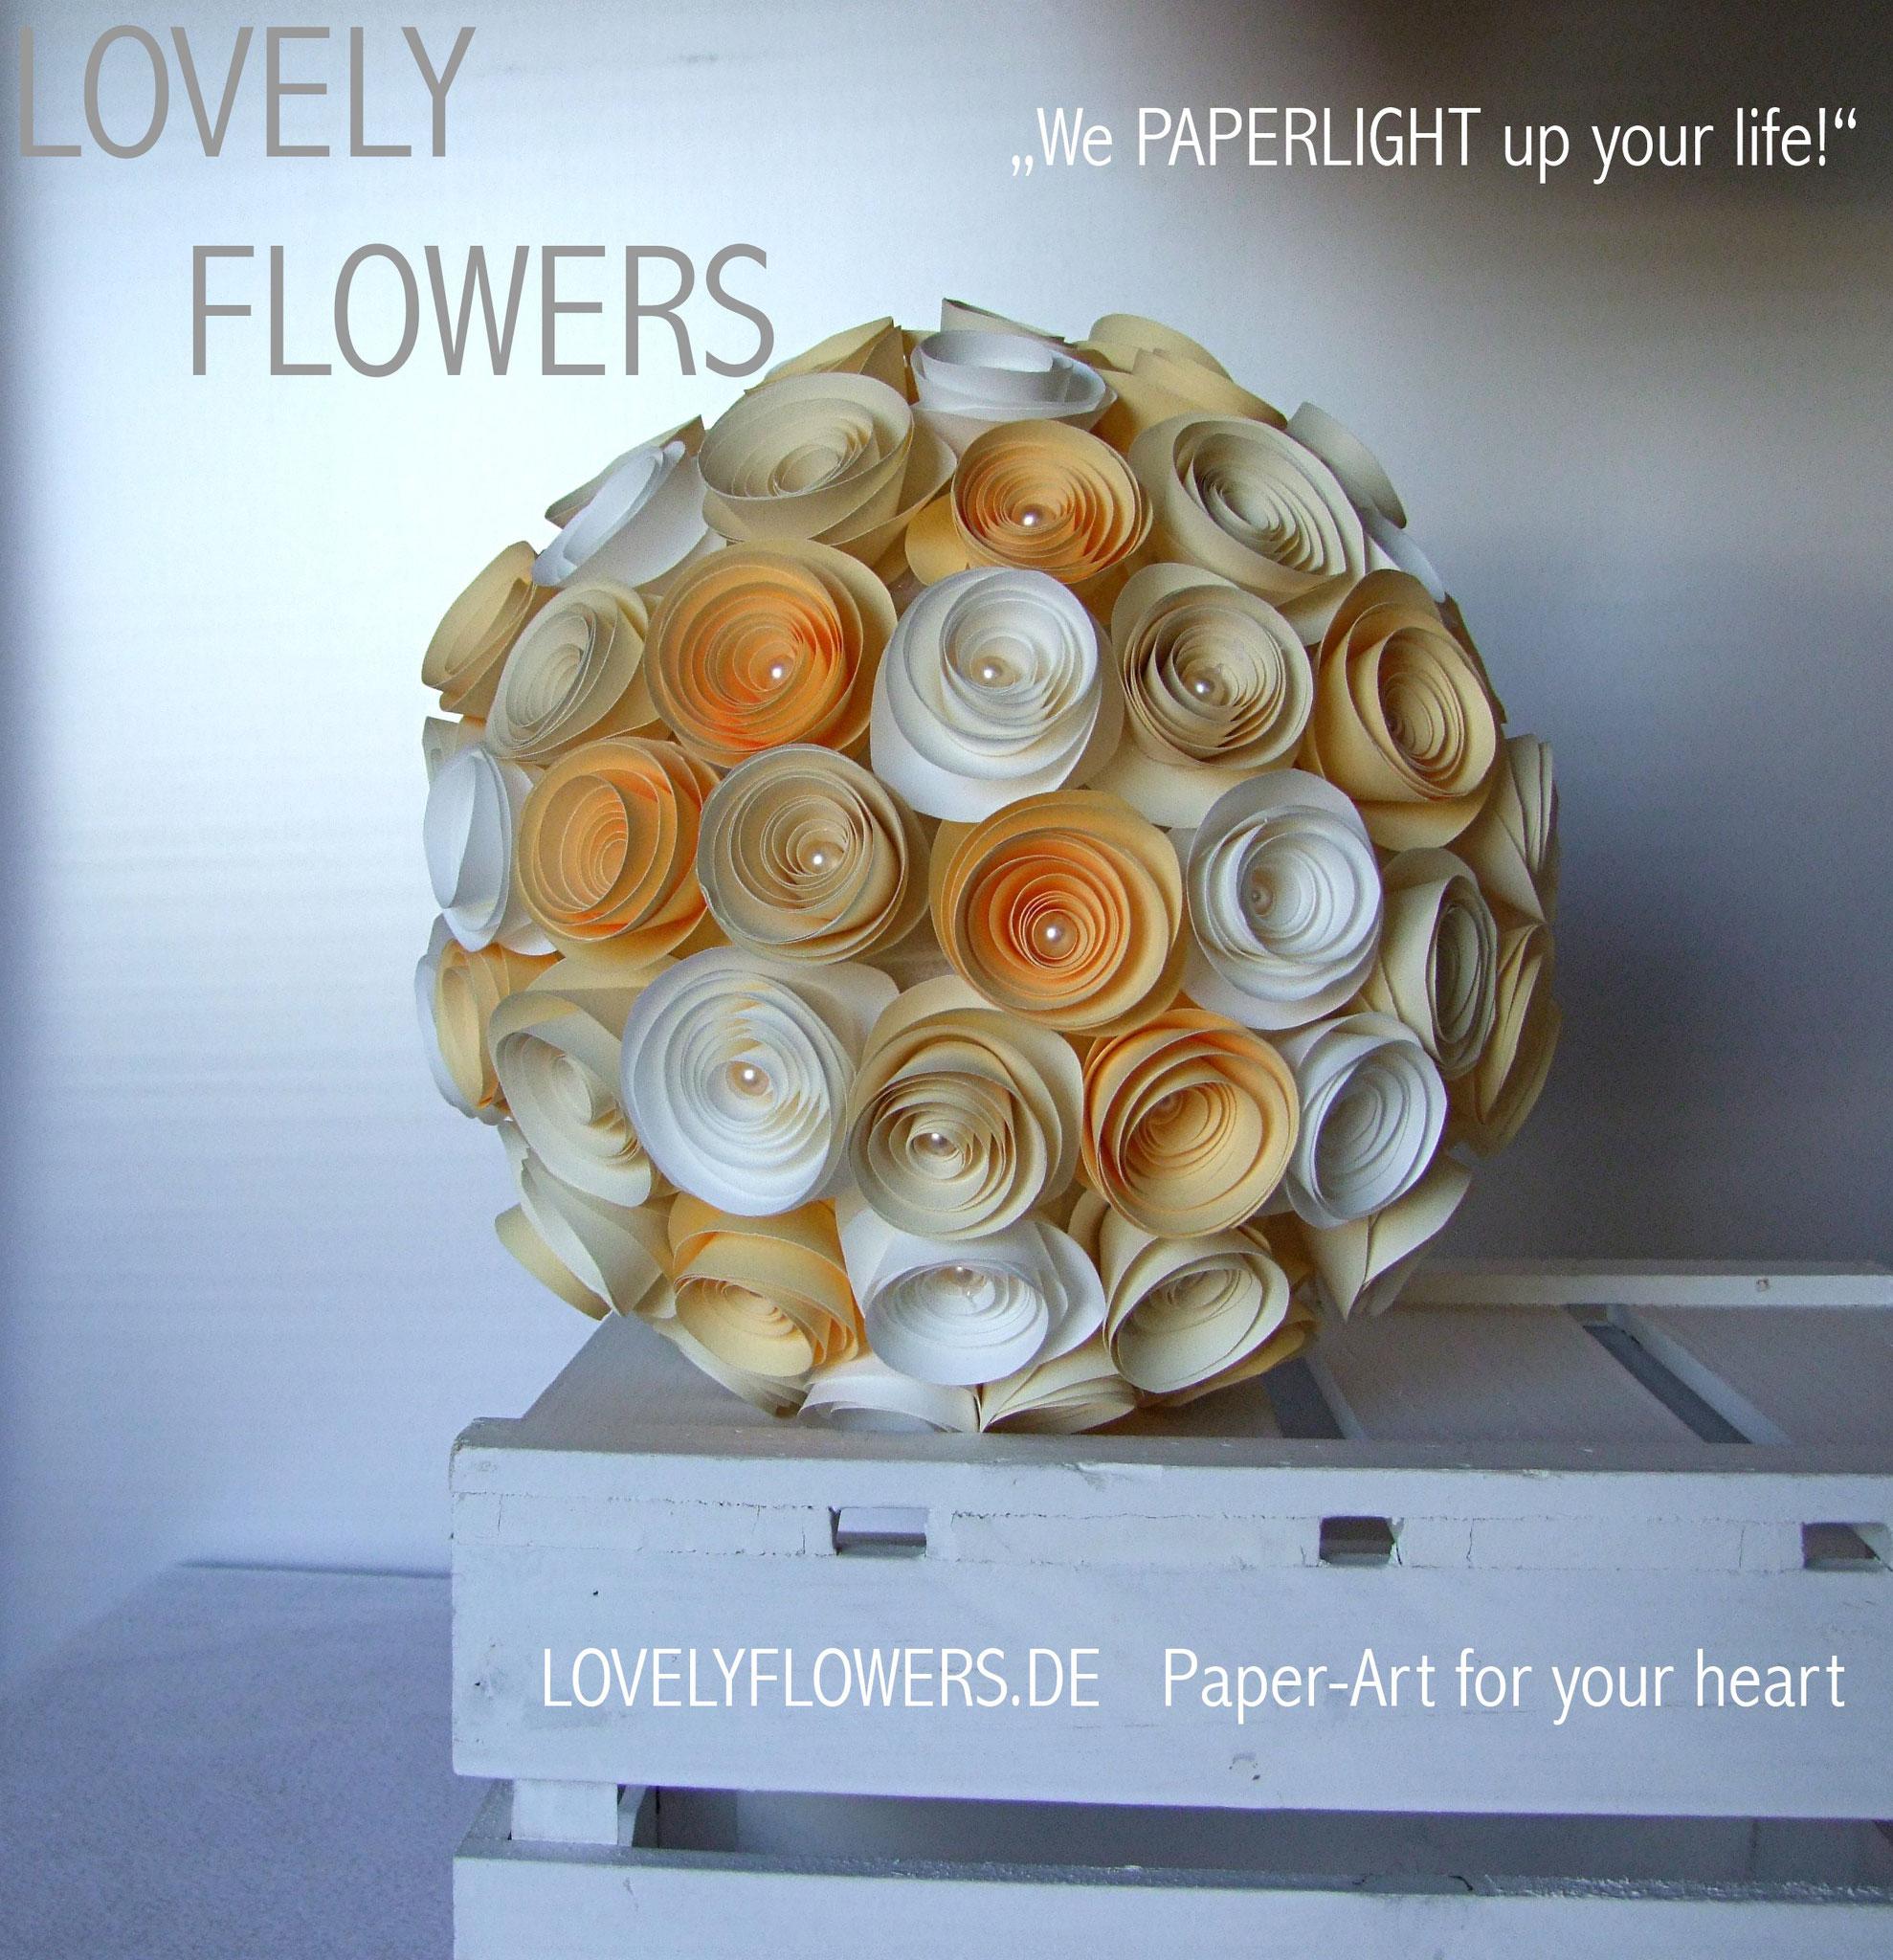 www.lovelyflowers.de - Paper Art Lampen gibts als Dekokugeln für jede Gelegenheit!